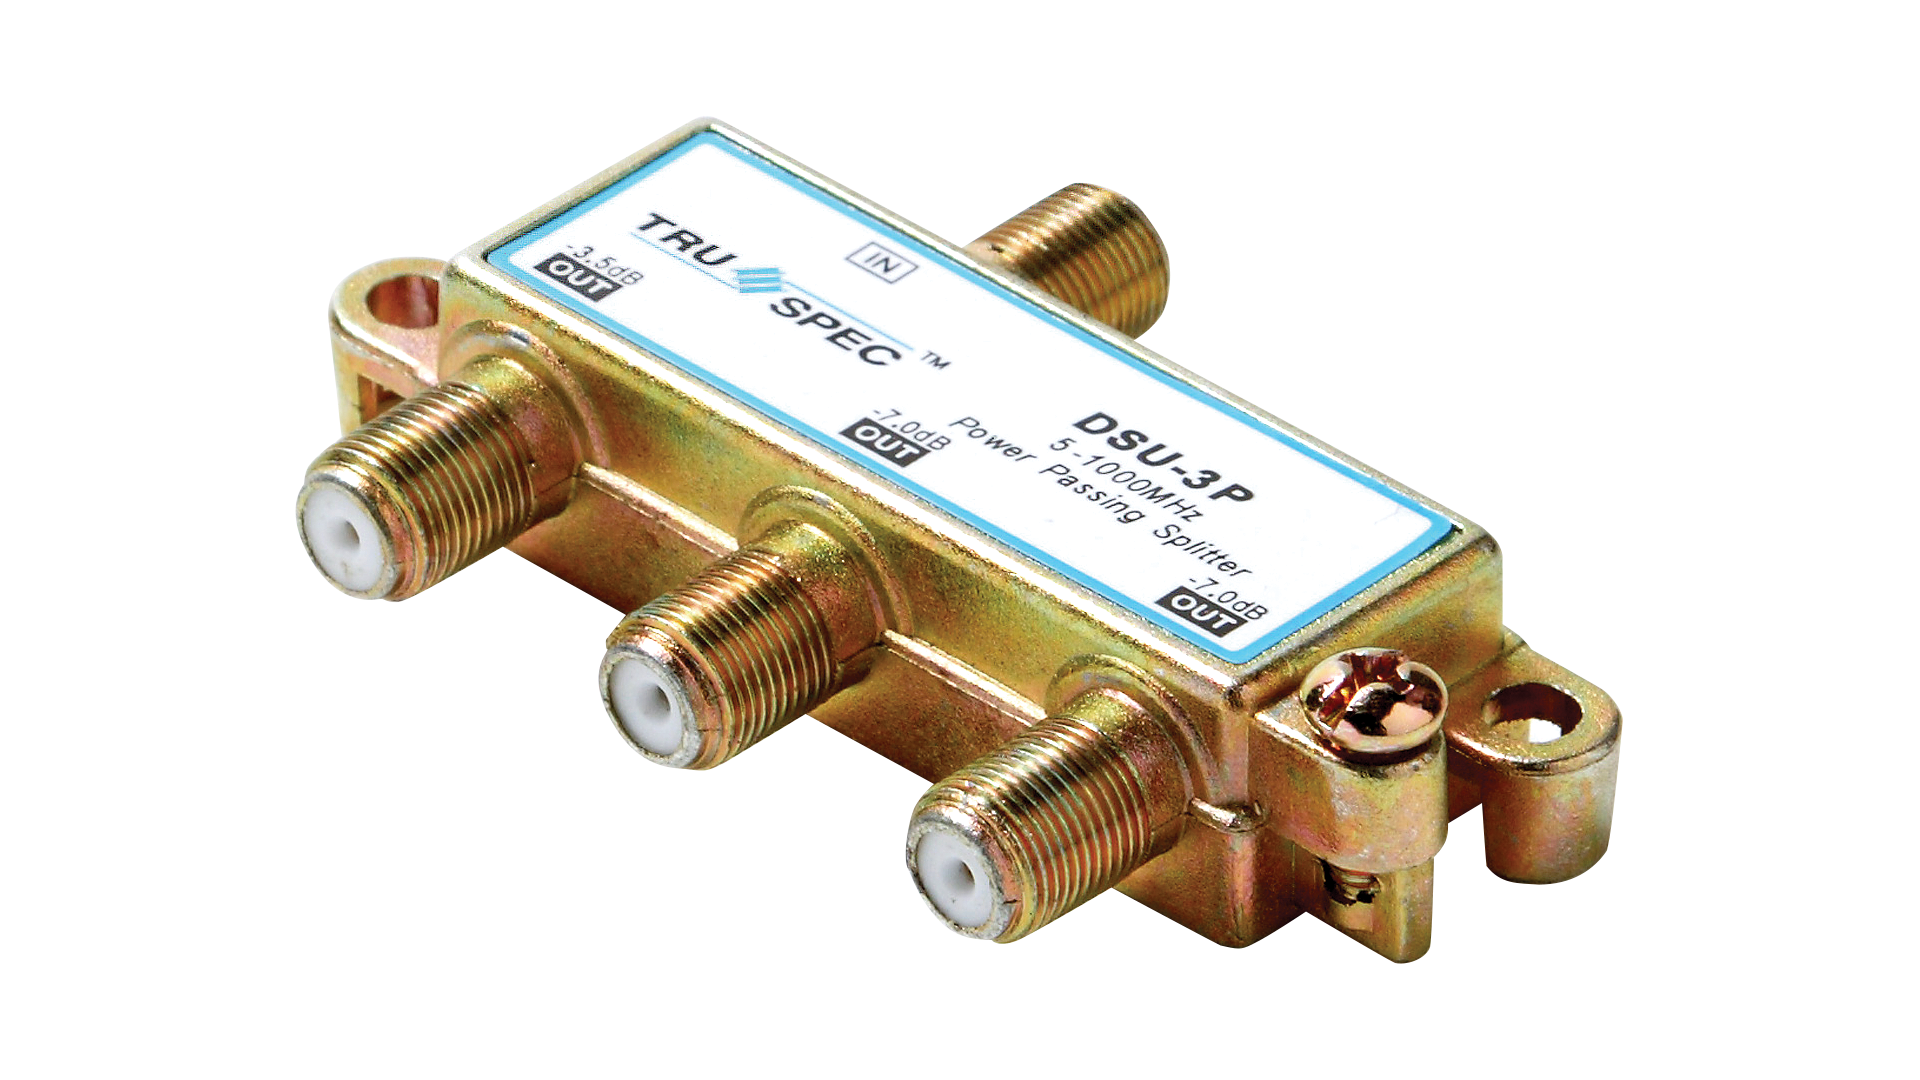 DSU-3P: 3-Port 1GHz Power Passing Splitter